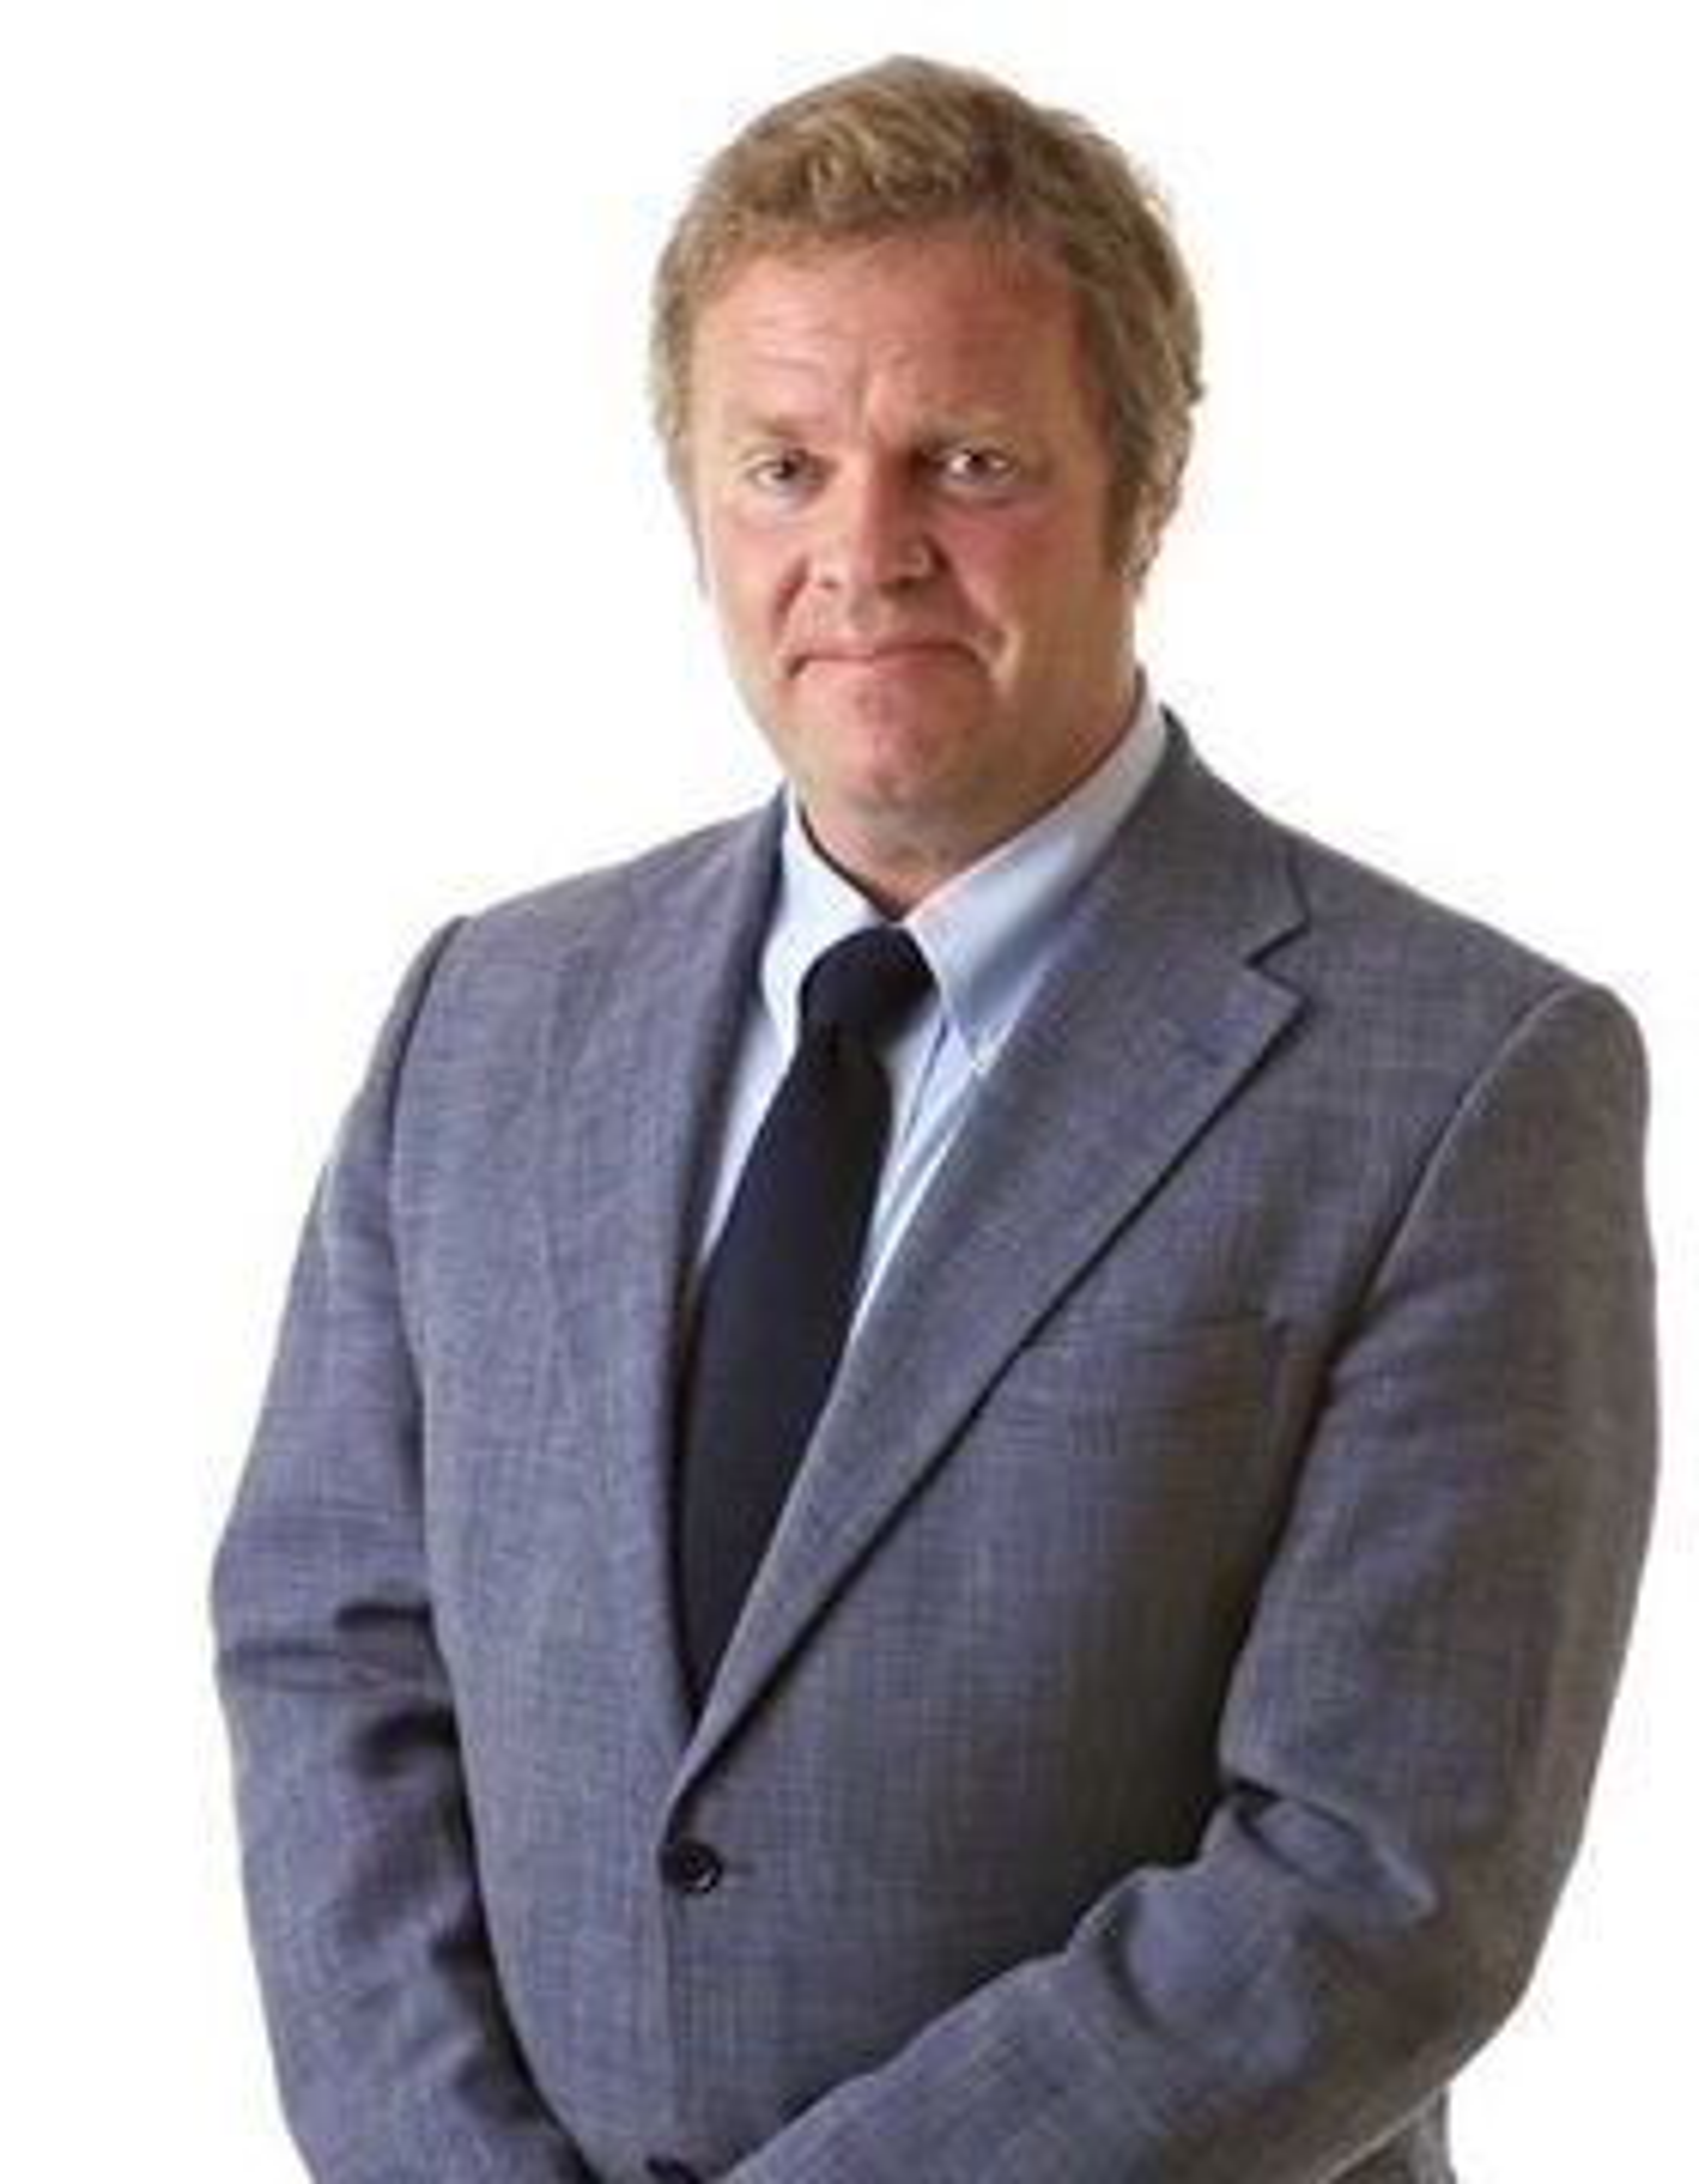 Advokat og partner i Bing Hodneland, Jon Wessel-Aas, bistår digi.no med anken til lagmannsretten.